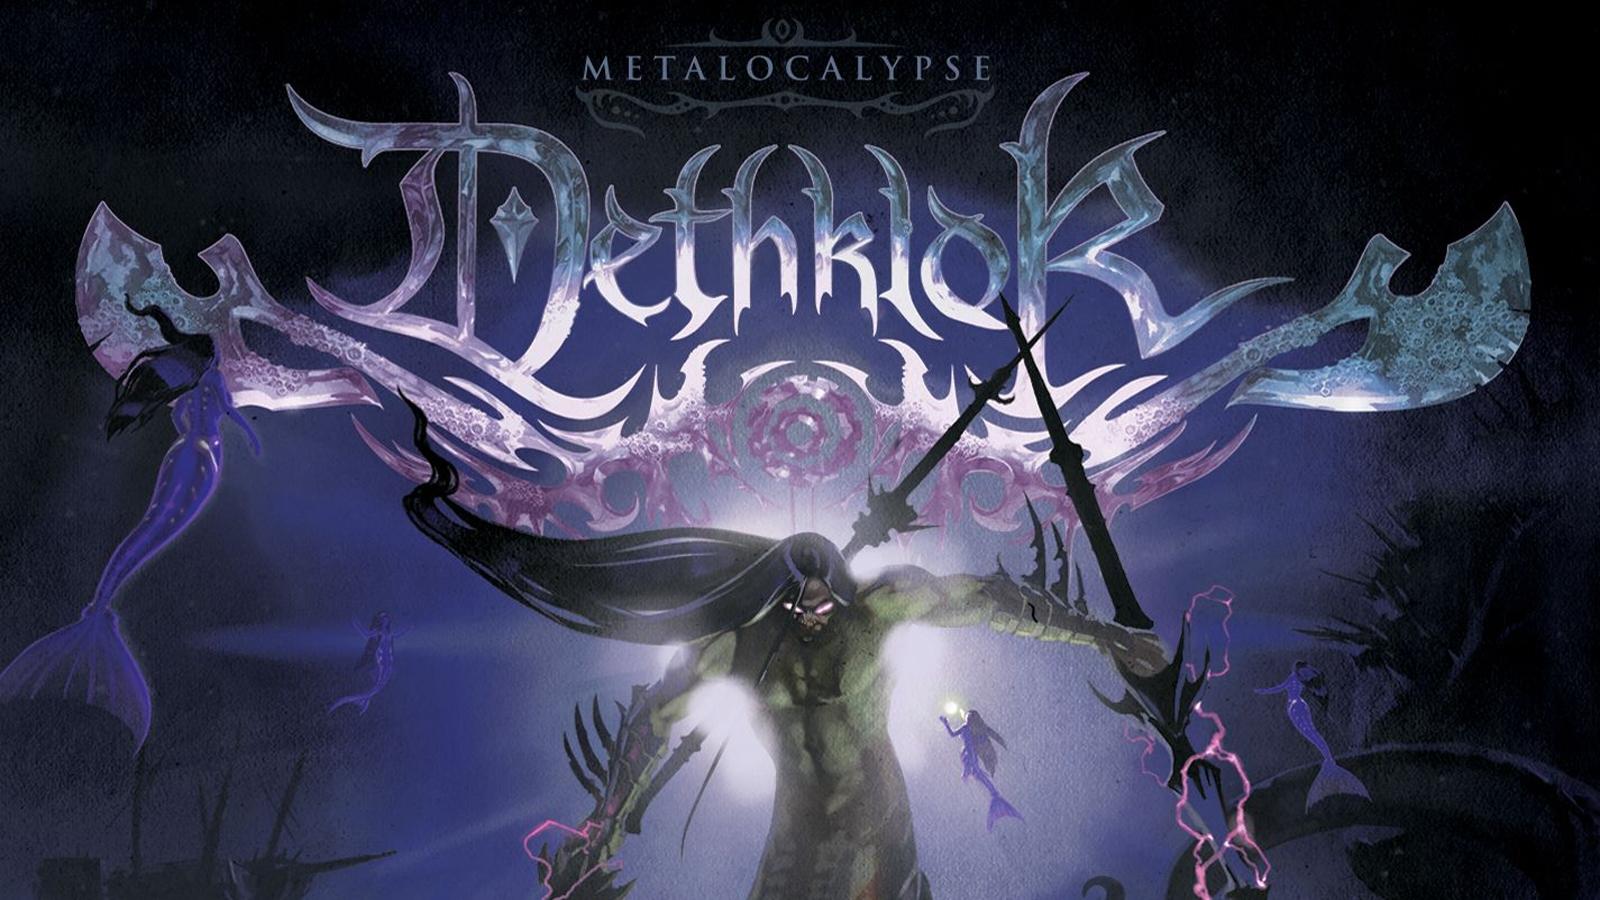 Dethklok heavy metal music cartoons hard rock band groups 1600x900